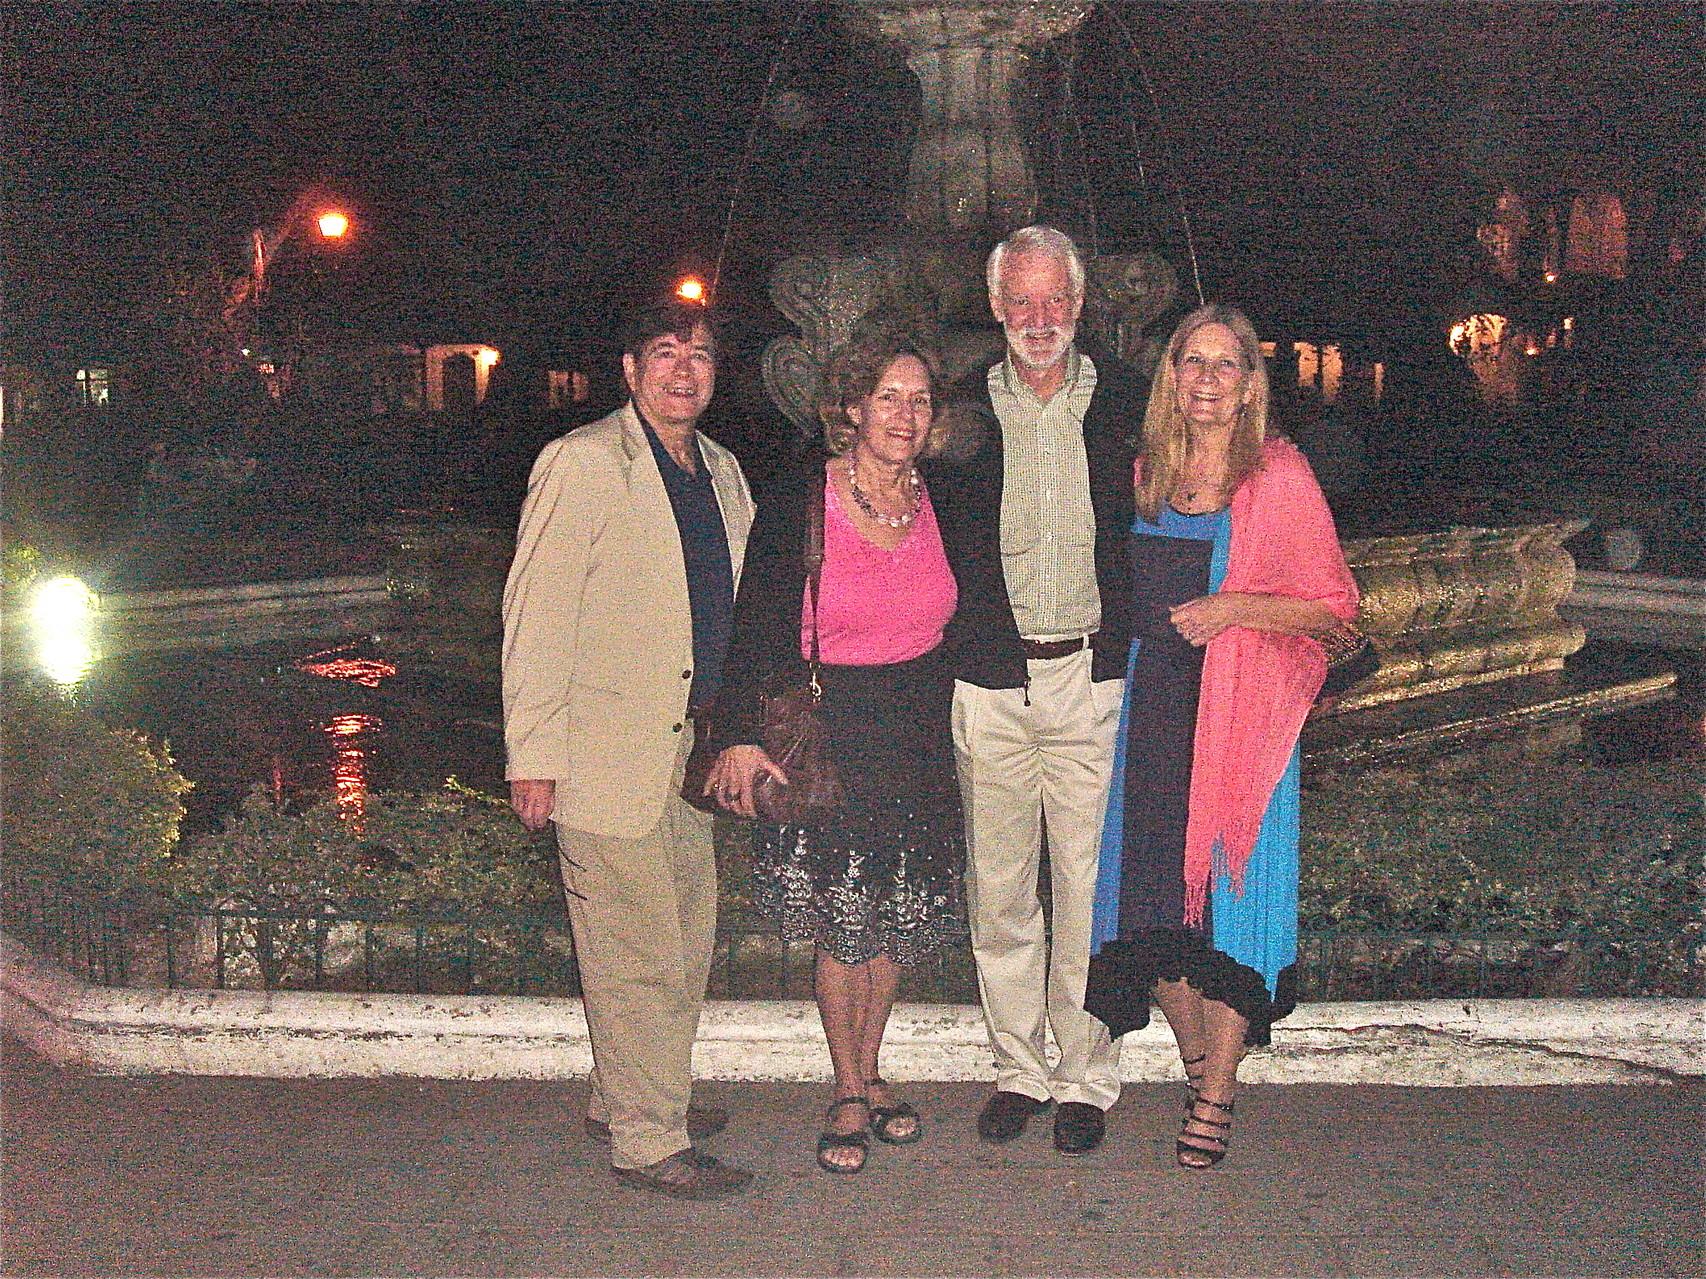 John, Lorraine, Don Bers & wife Kathy